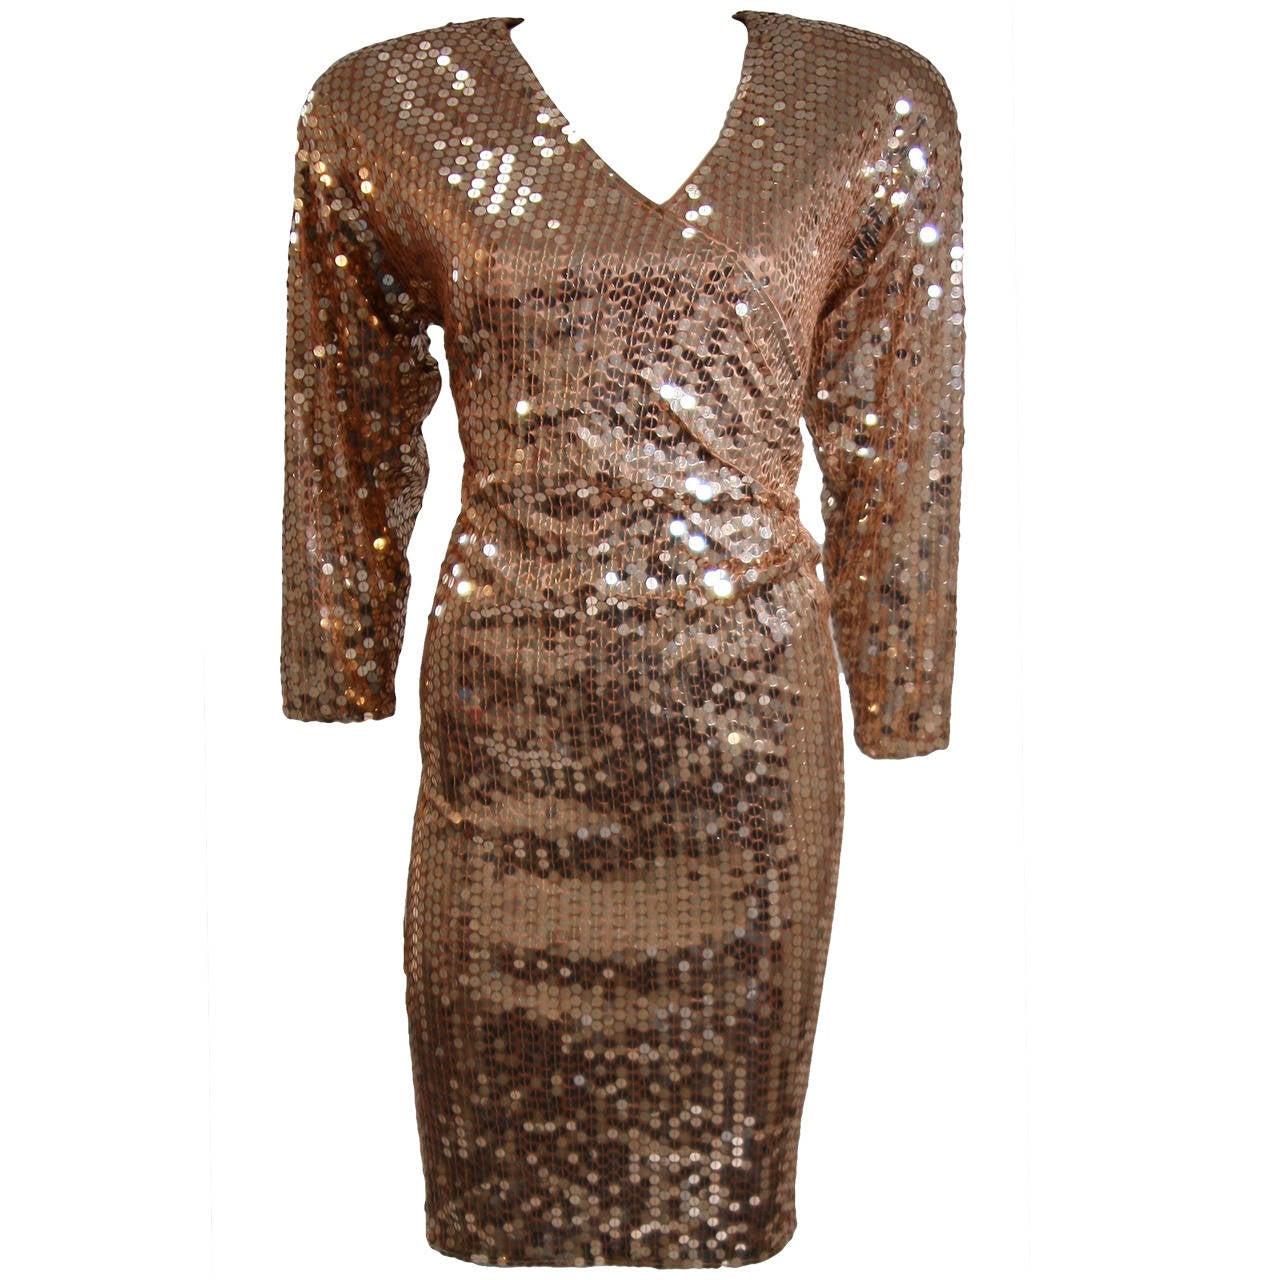 Oleg Cassini Champagne Rose Gold Sequin Cocktail Dress Large 1